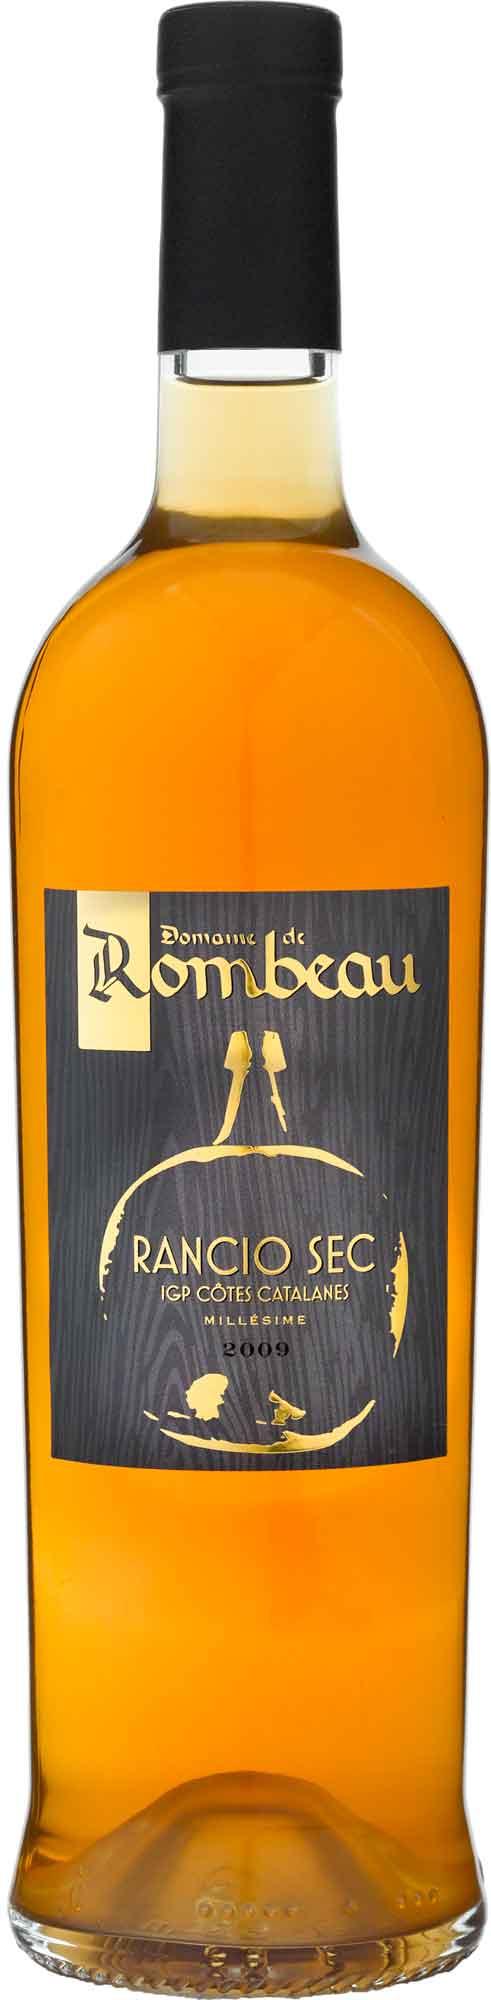 Domaine de Rombeau Rancio Sec 2009